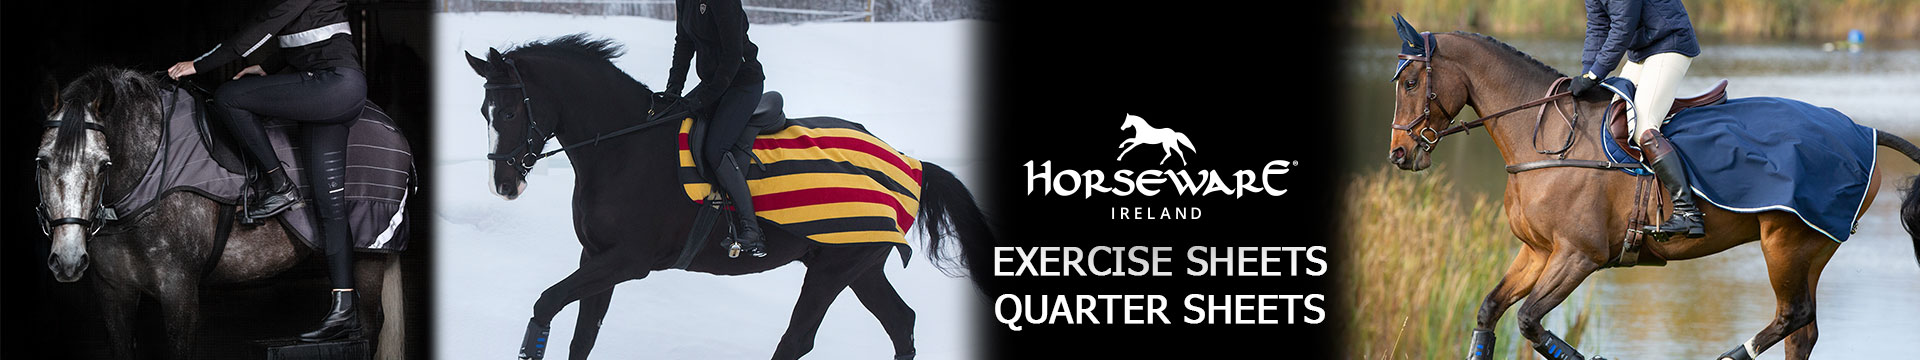 Horseware Quarter Sheets/Exercise Sheets